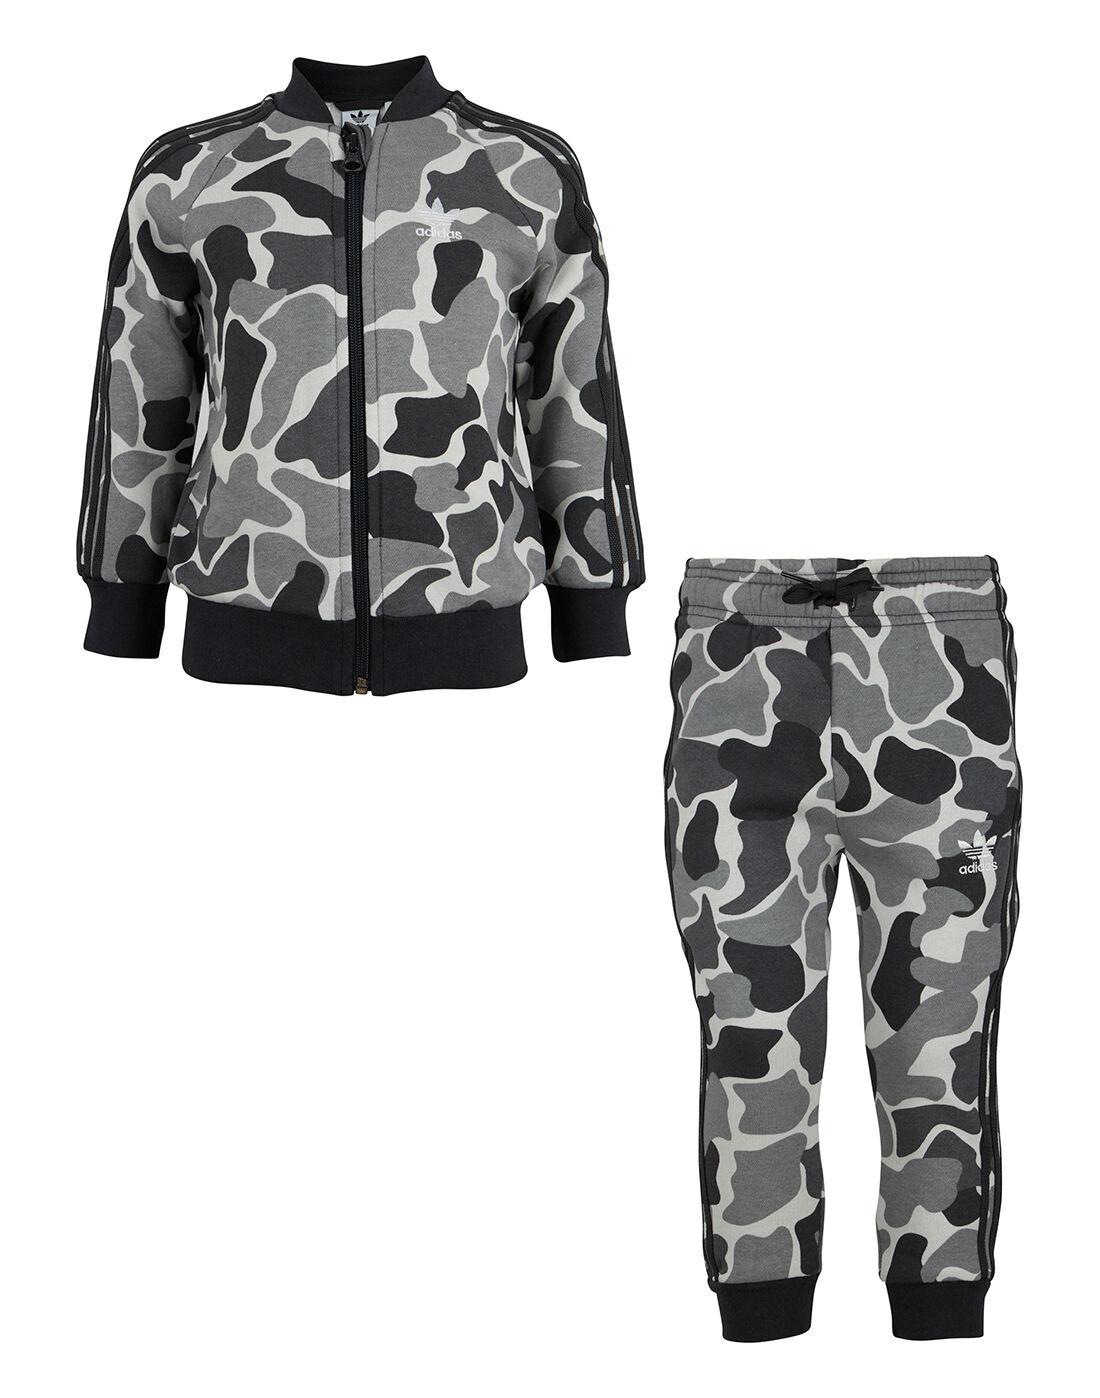 Boys Camouflage Tracksuit Fleece Jogging Bottoms Pants Hoodie Set Age 7-14 Years